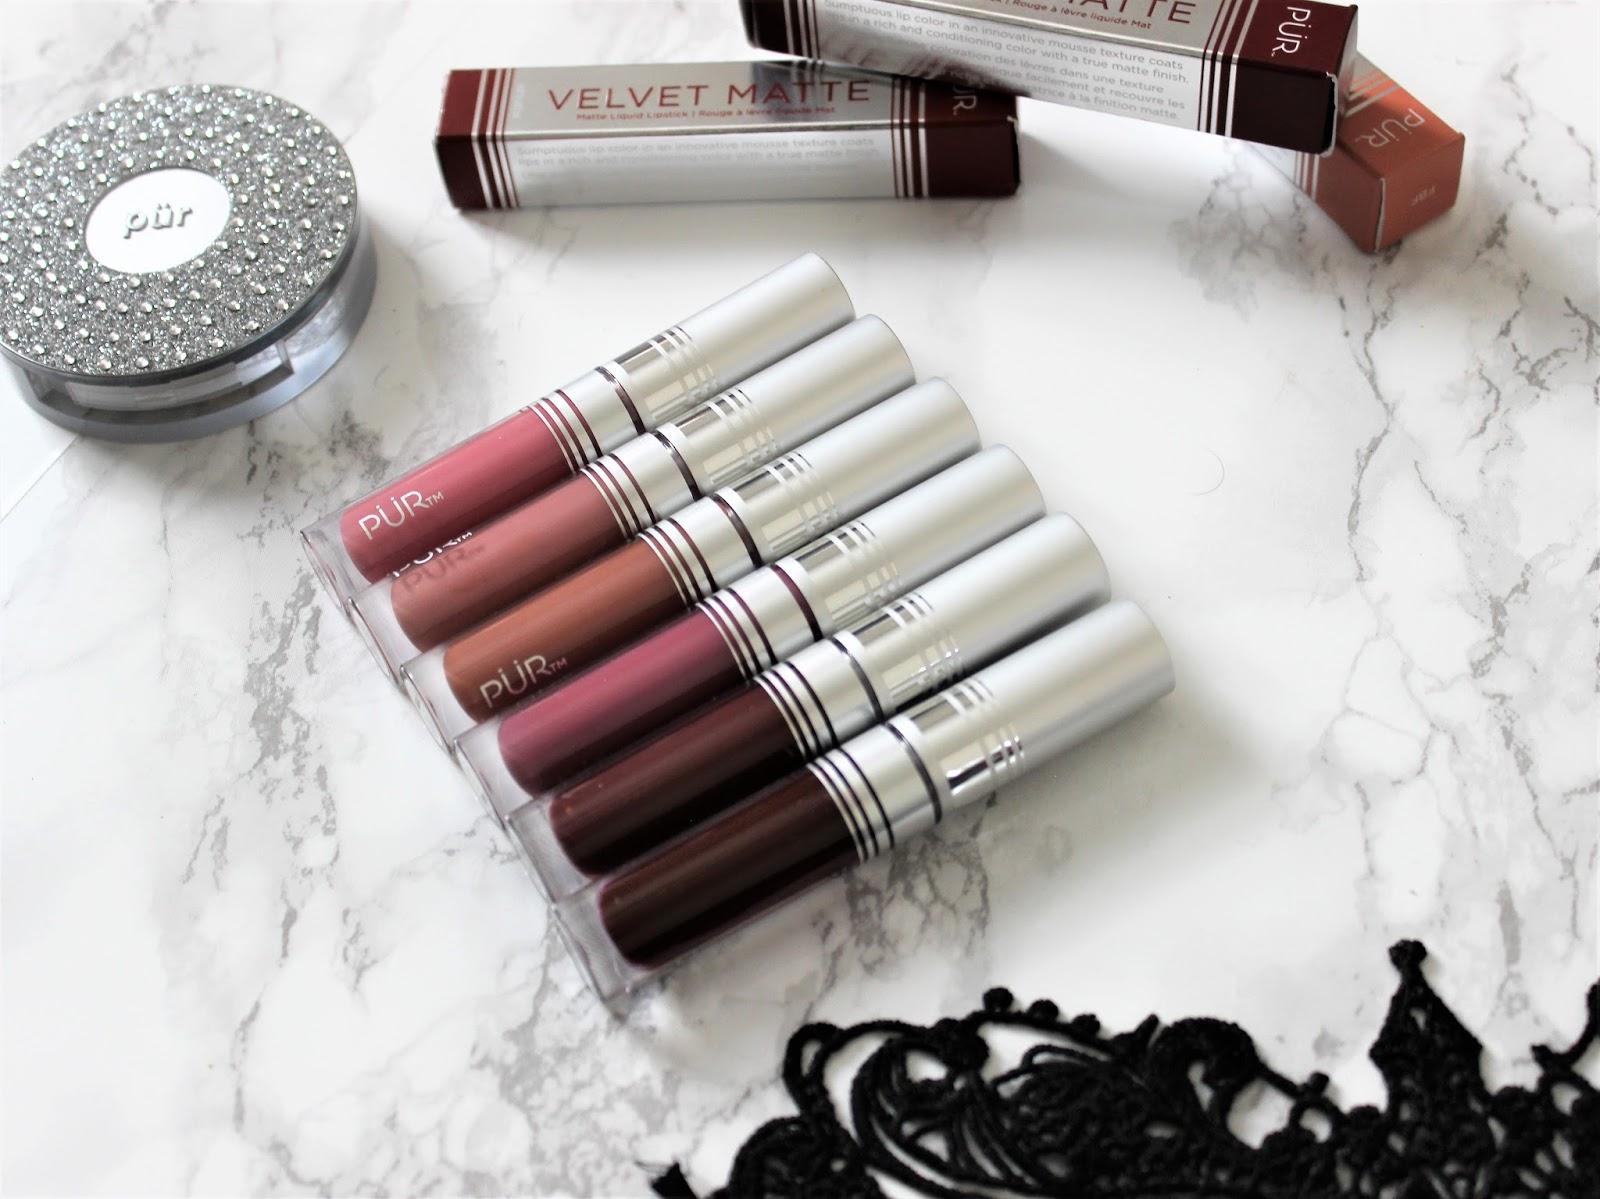 Pur Velvet Matte Liquid Lipstick Review